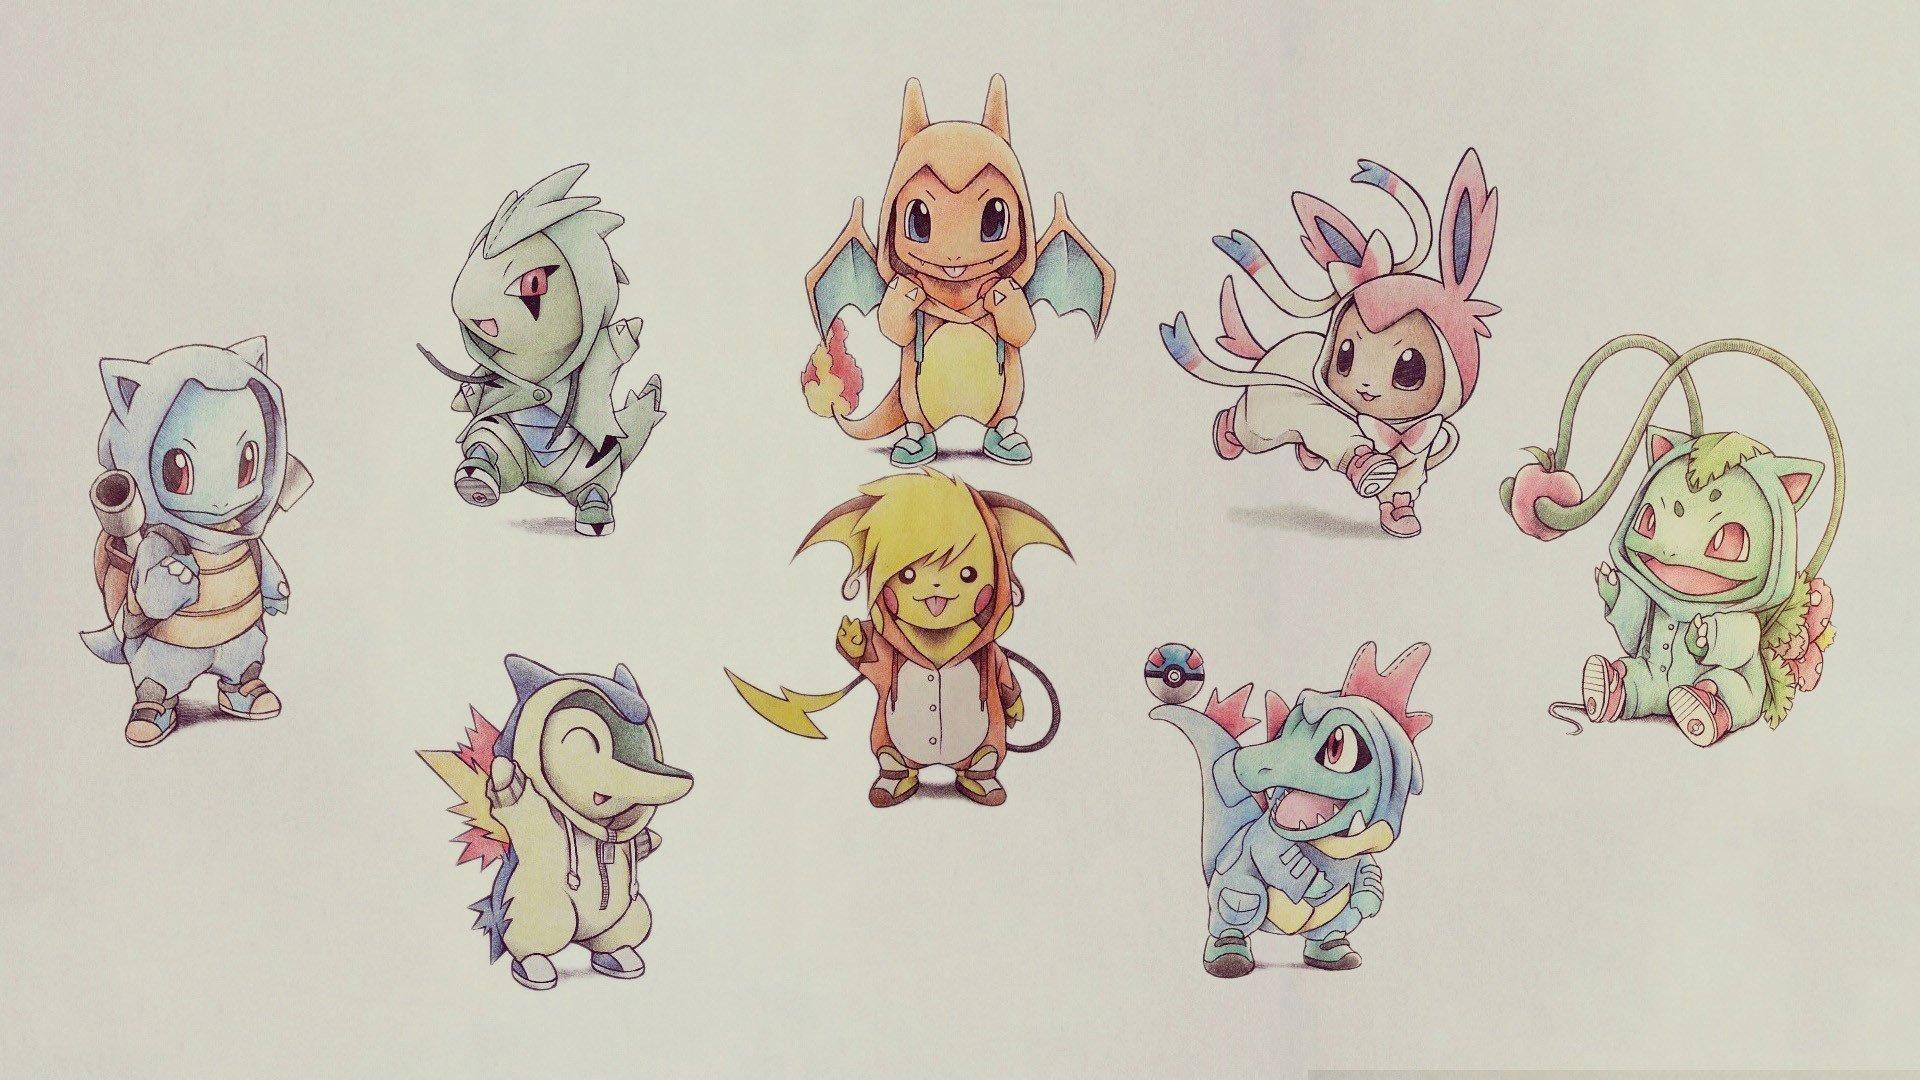 wallpaper.wiki-Pokemon-Phone-Eevee-Image-HD-PIC-